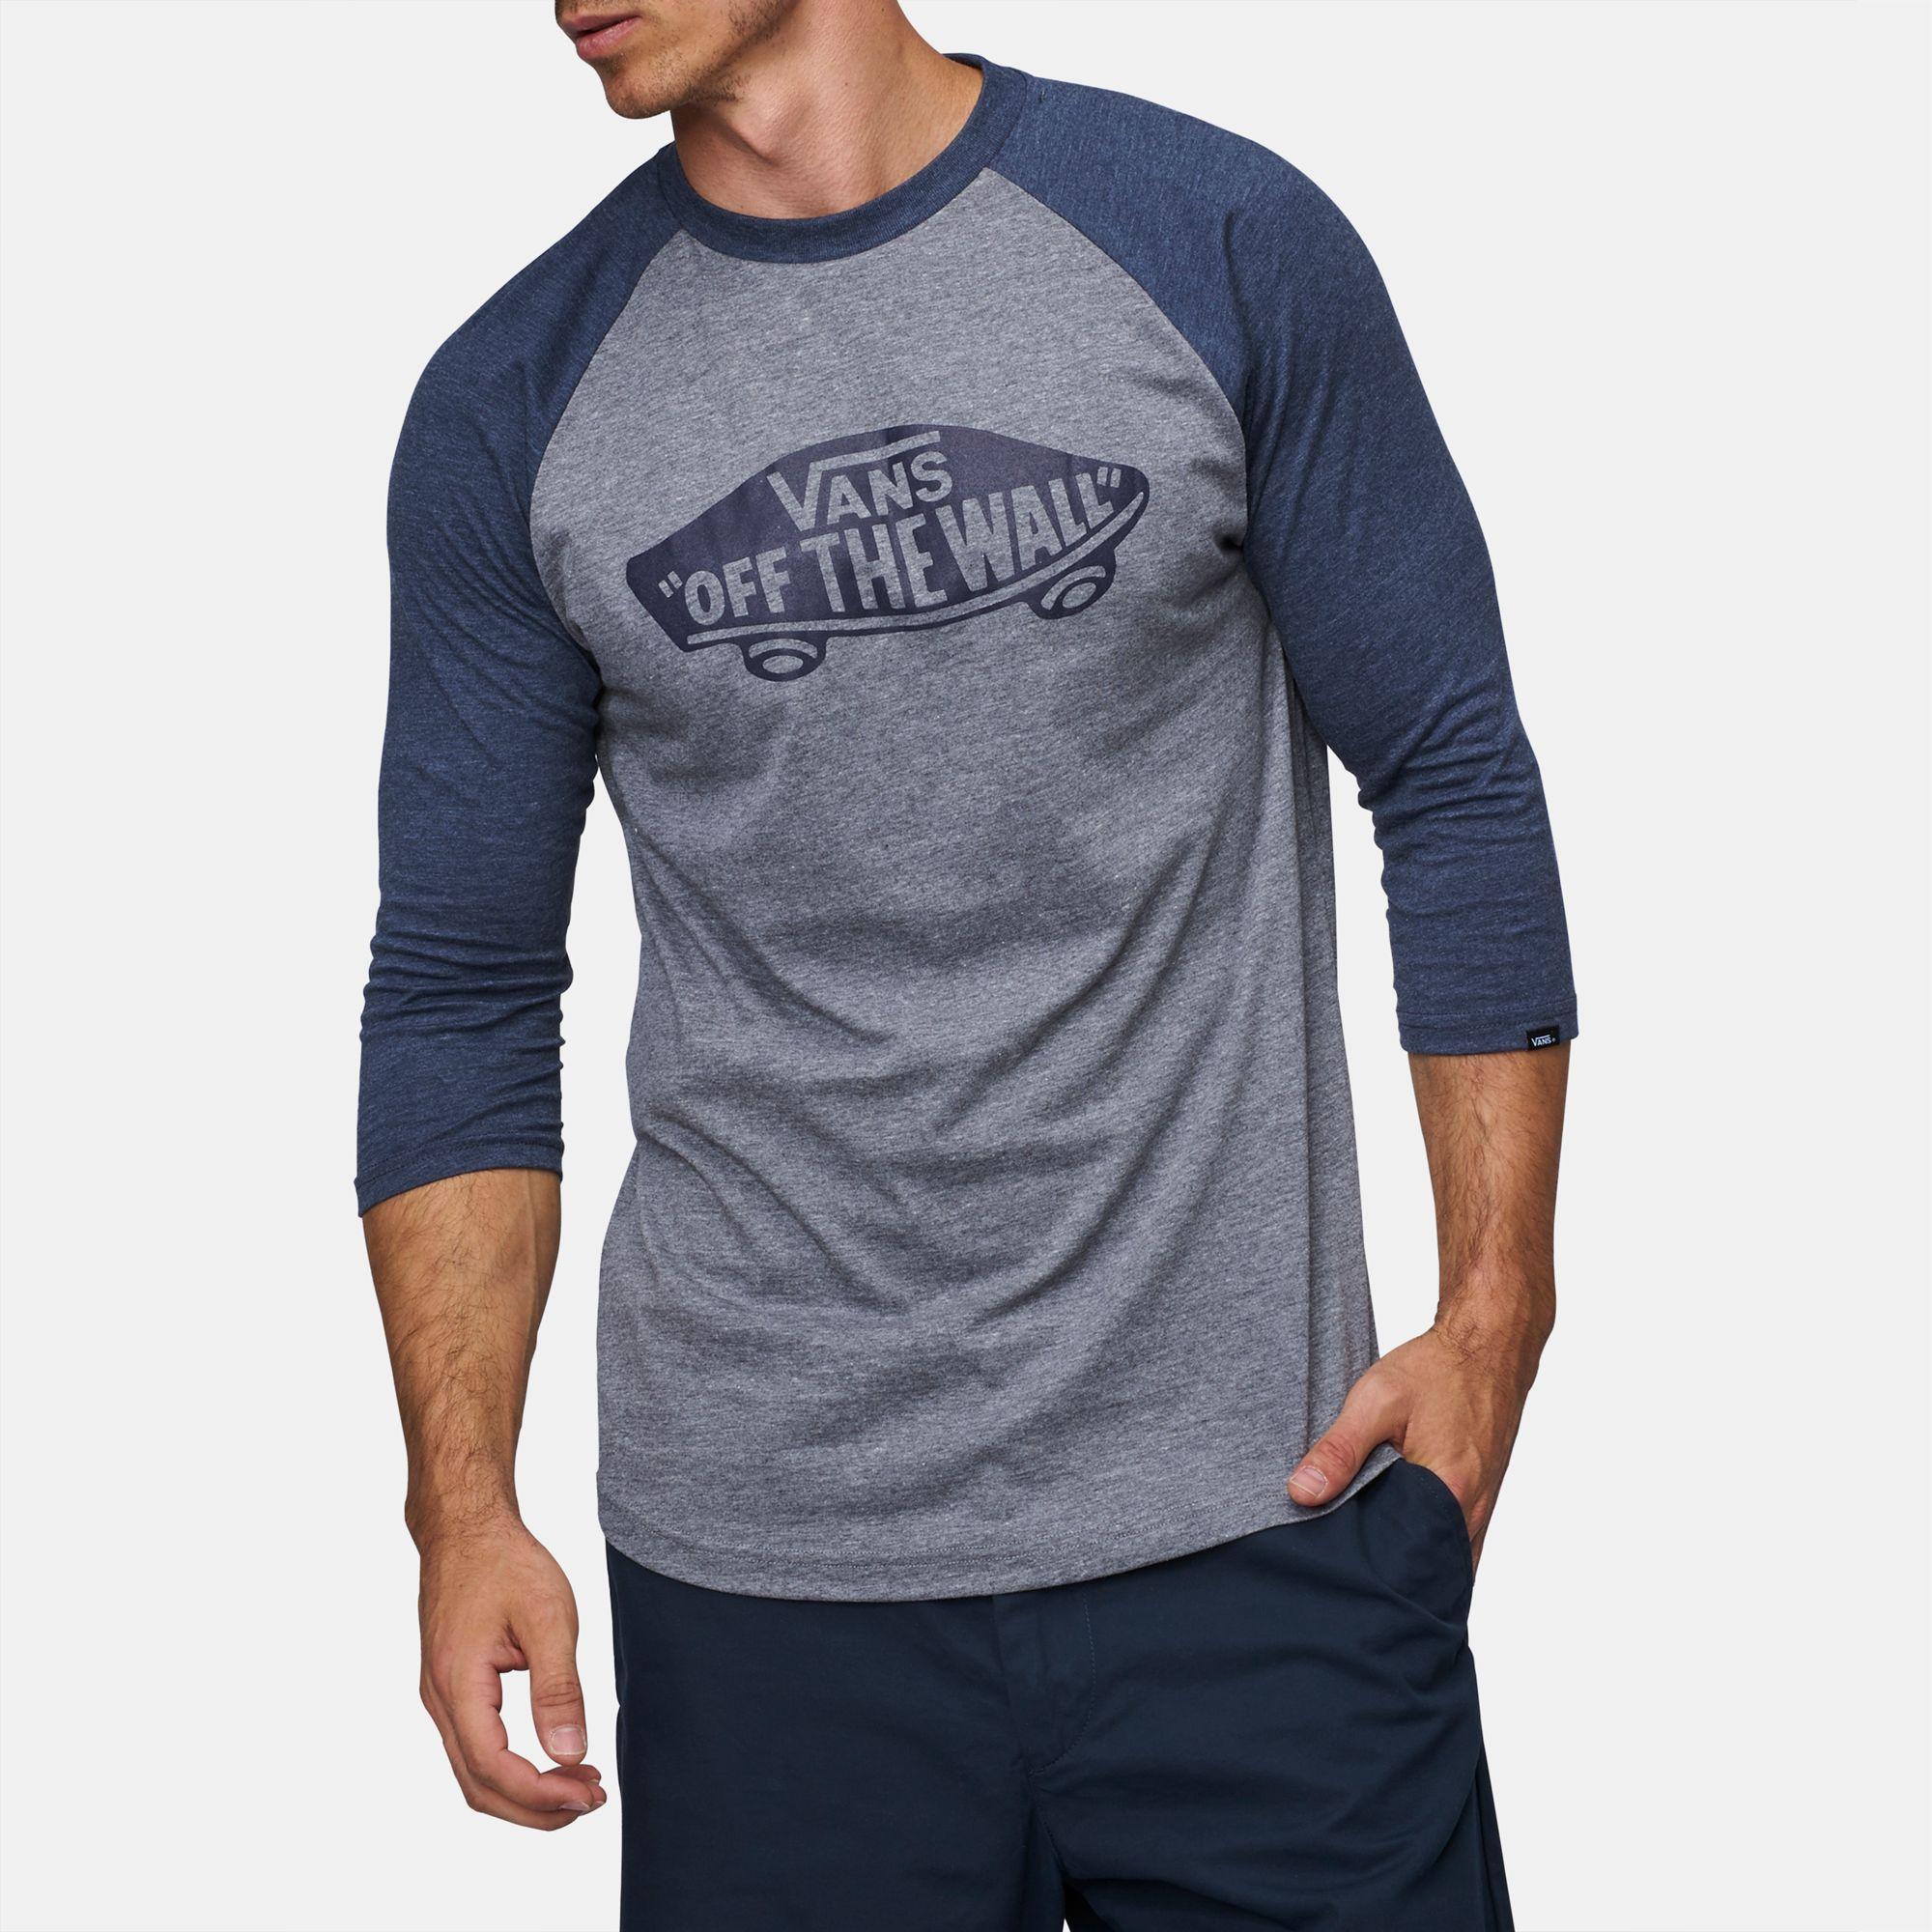 a1b552b259 Shop 41 Vans Off The Wall Raglan T-Shirt for Mens by Vans -45